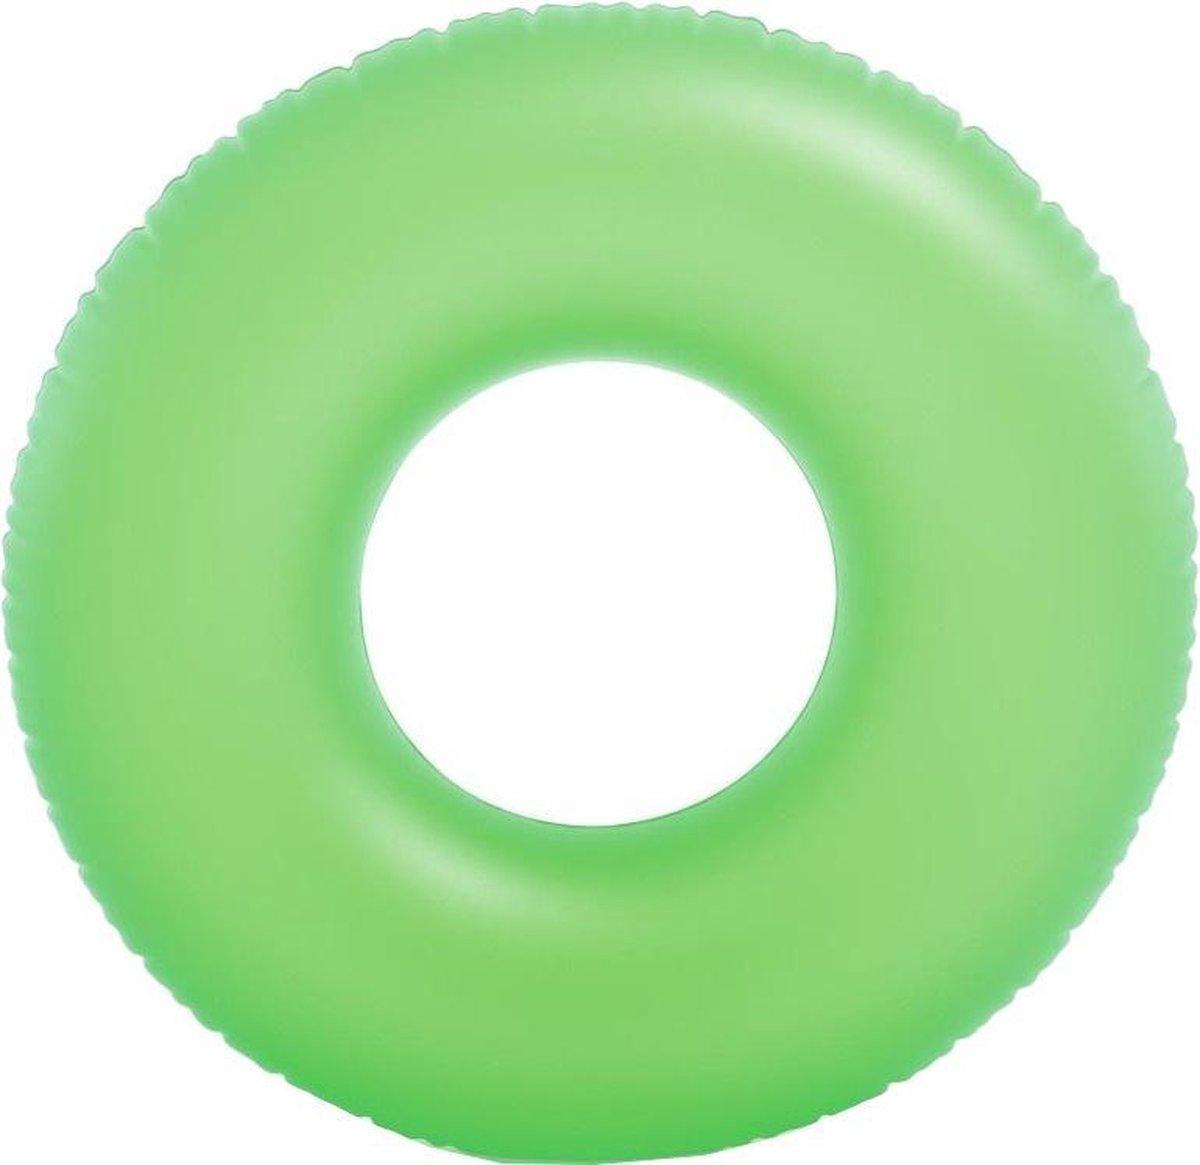 Intex Zwemband Groen 91 Cm